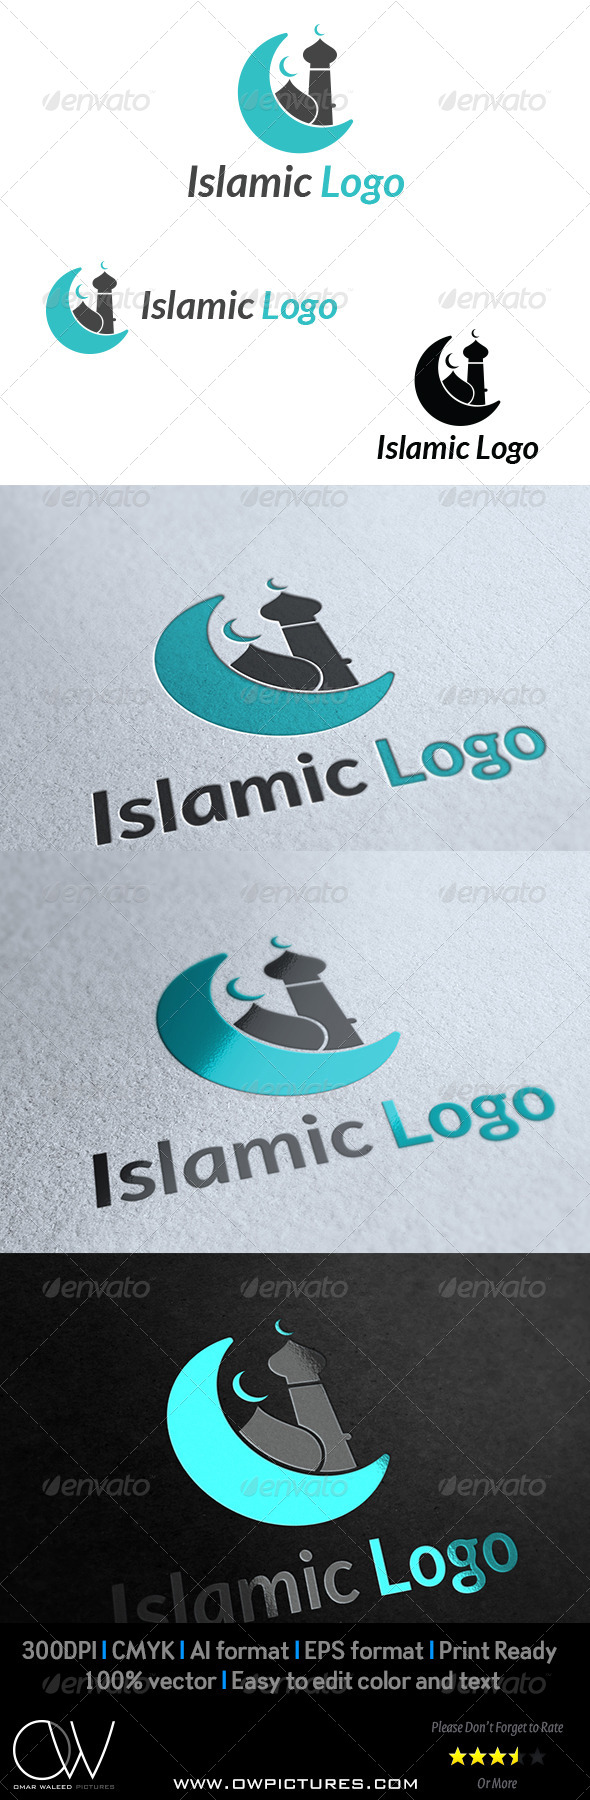 GraphicRiver Islamic Logo 5279929